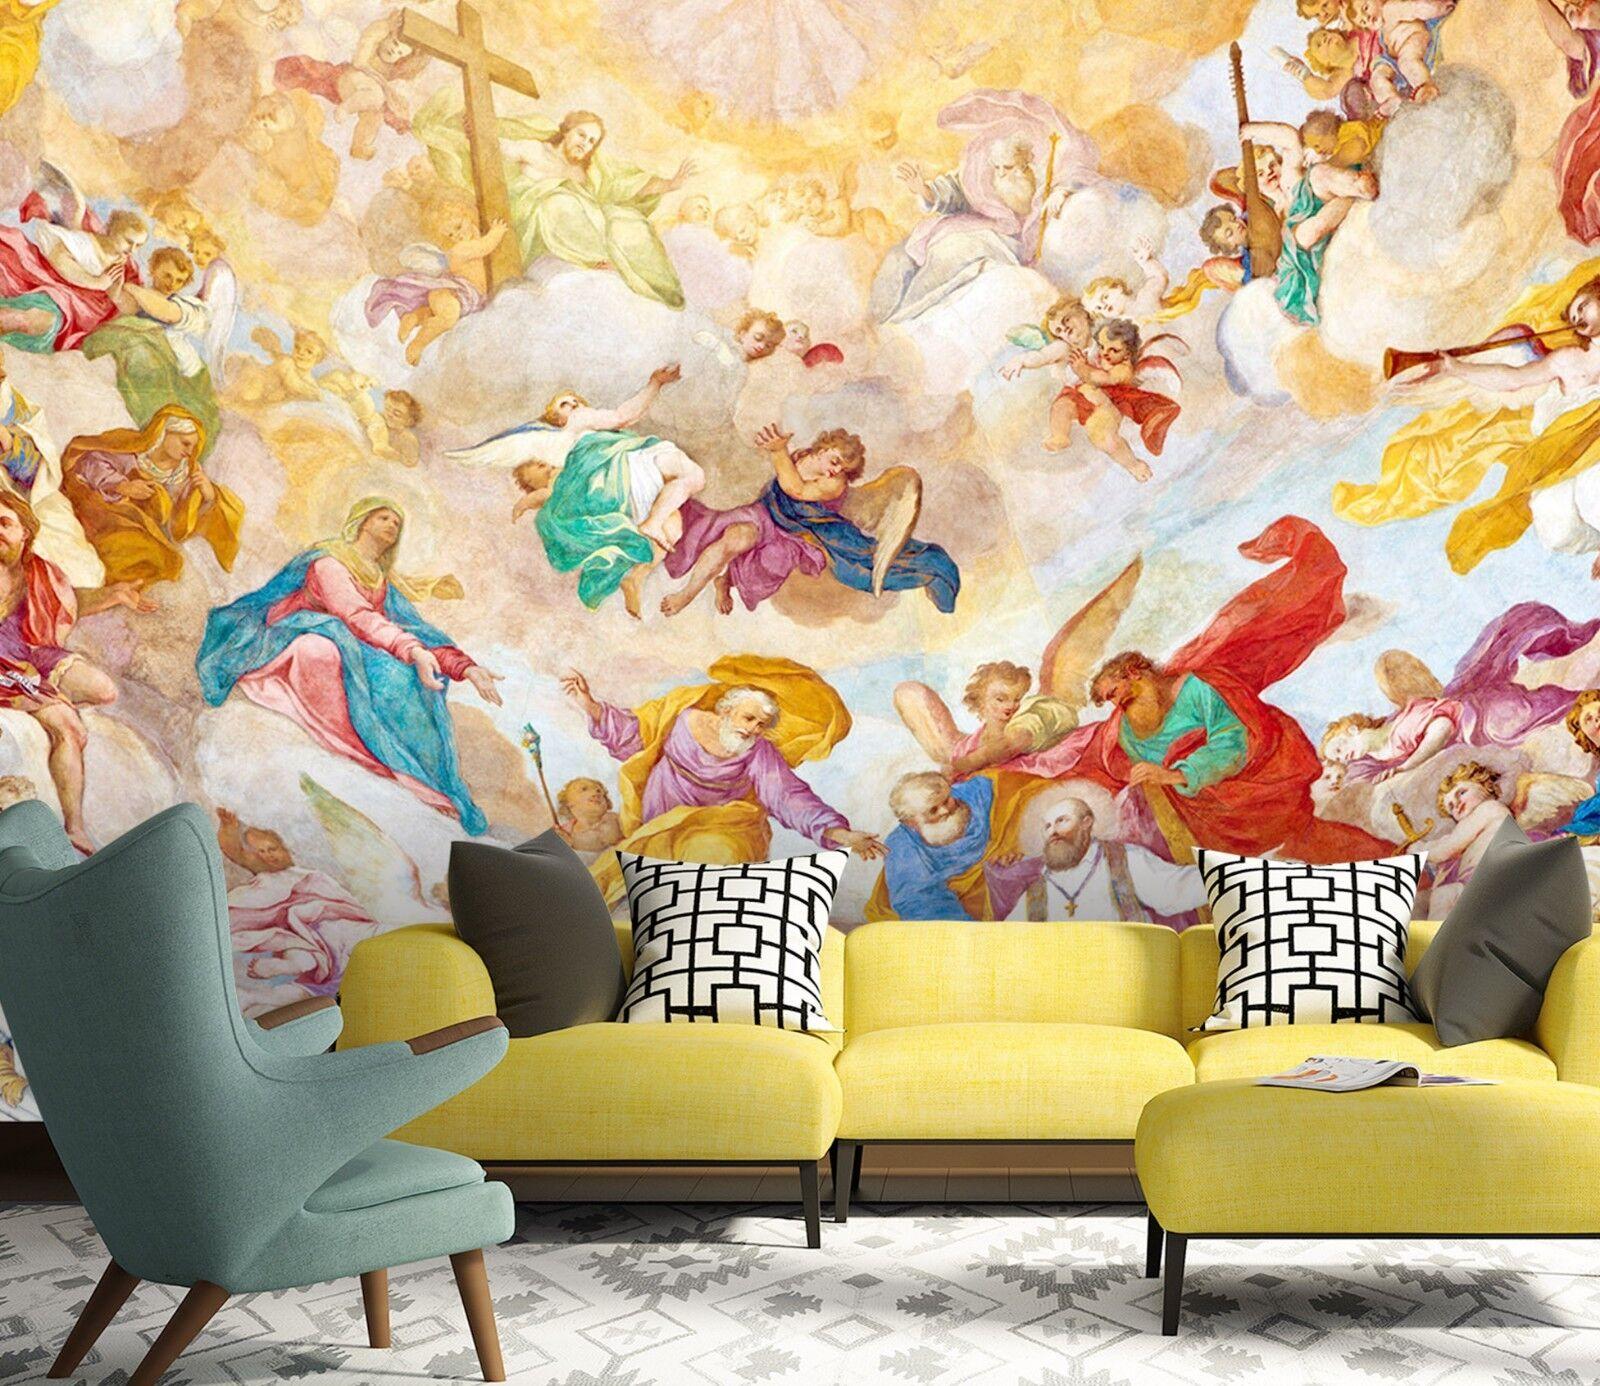 3D Farbige Kleidung Engel 7 Tapete Wandgemälde Tapete Tapeten Familie Kinde DE